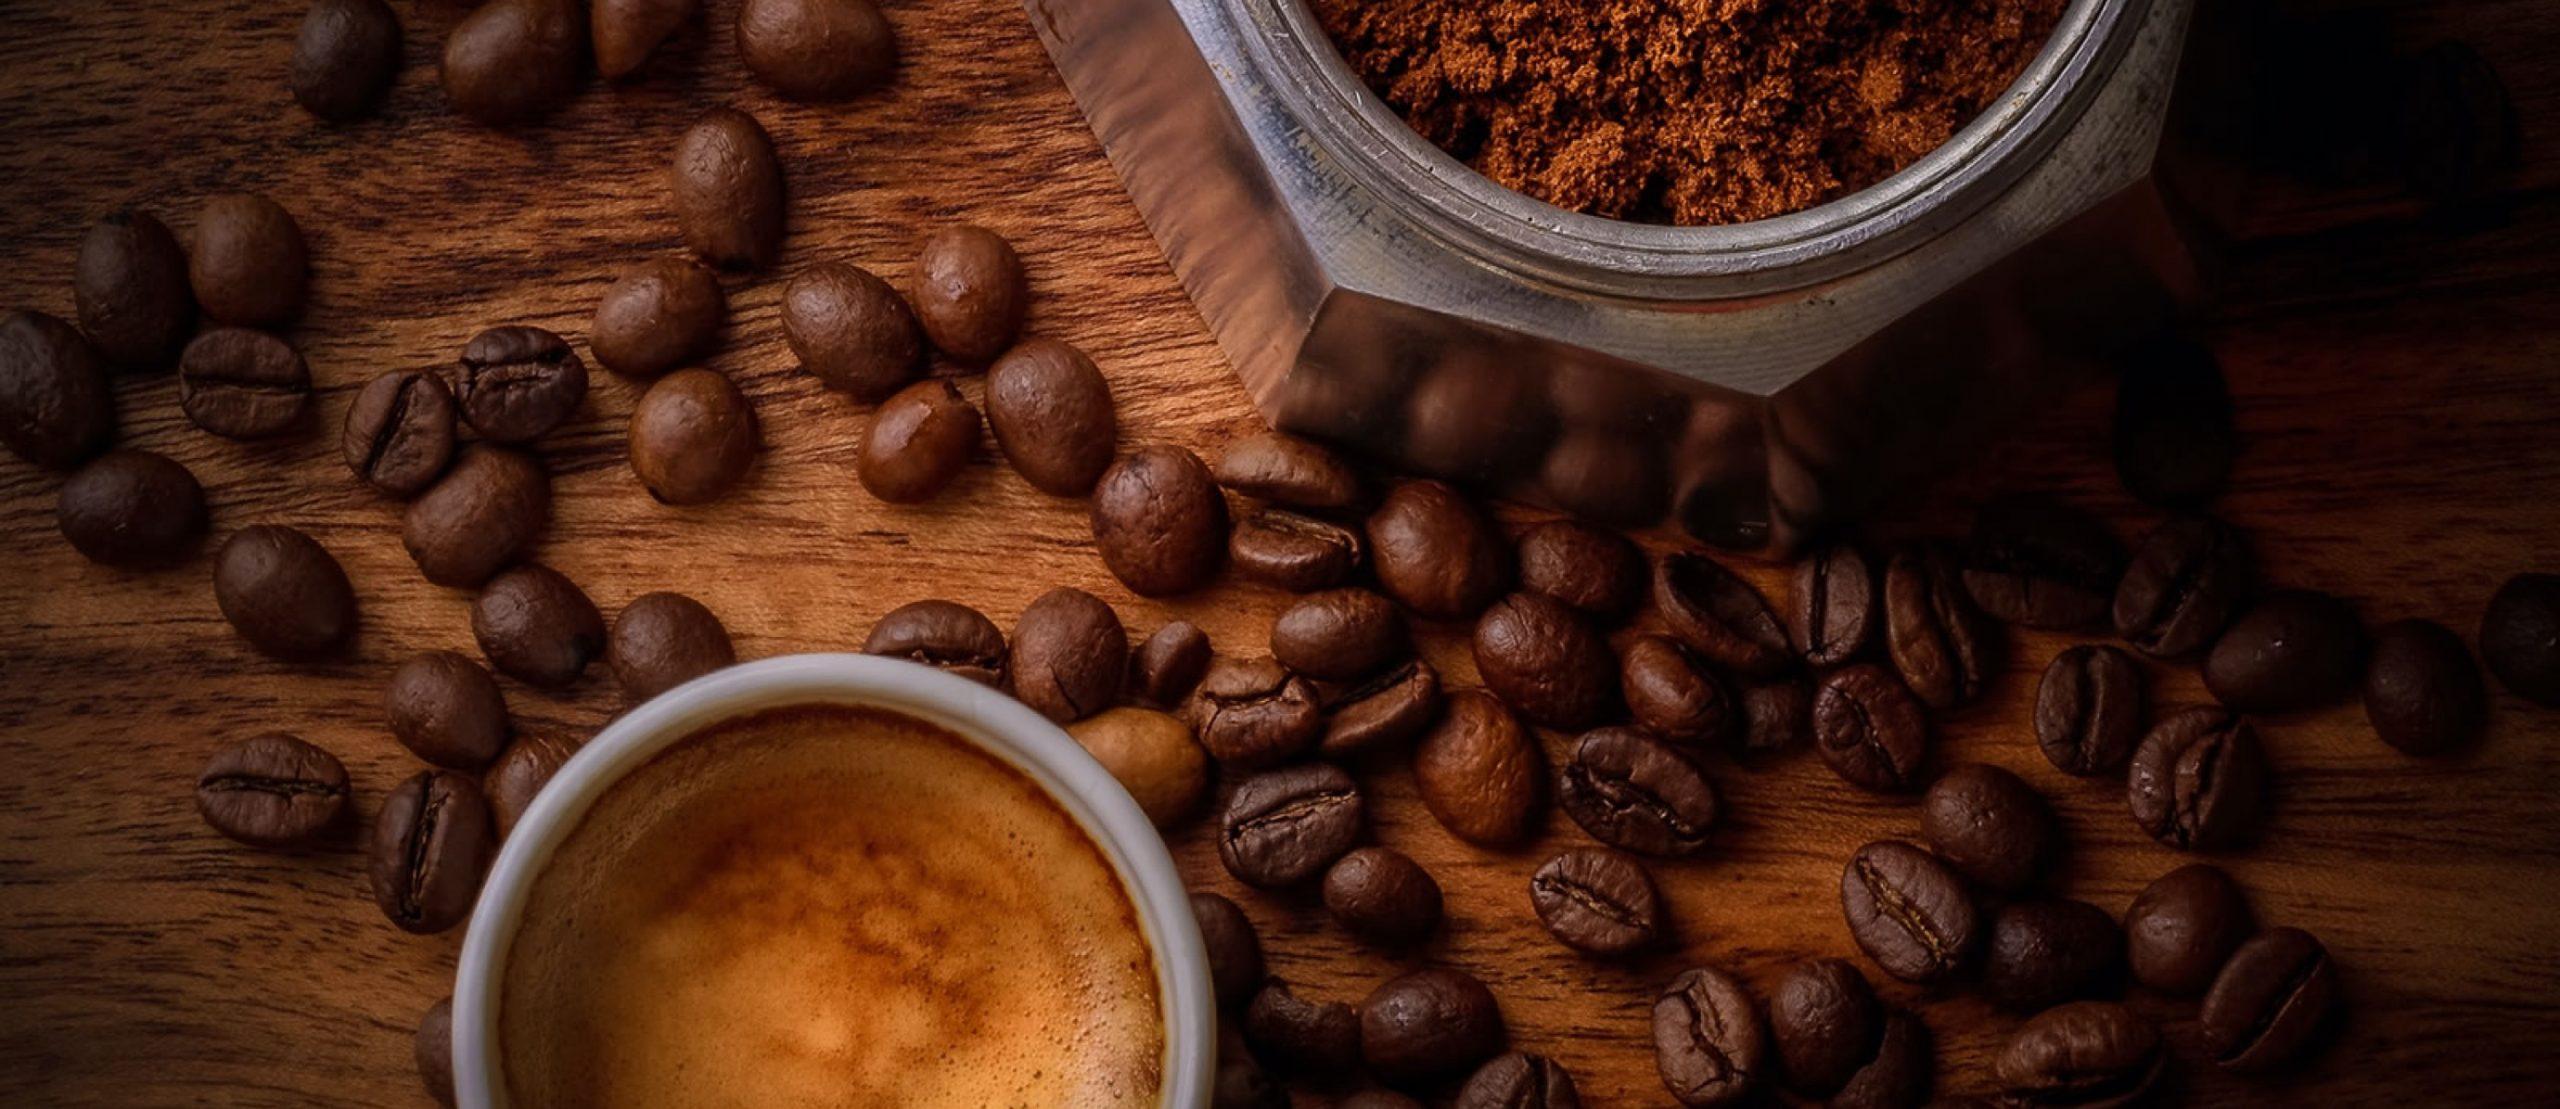 Caffia coffee beans with a mug on a tabletop